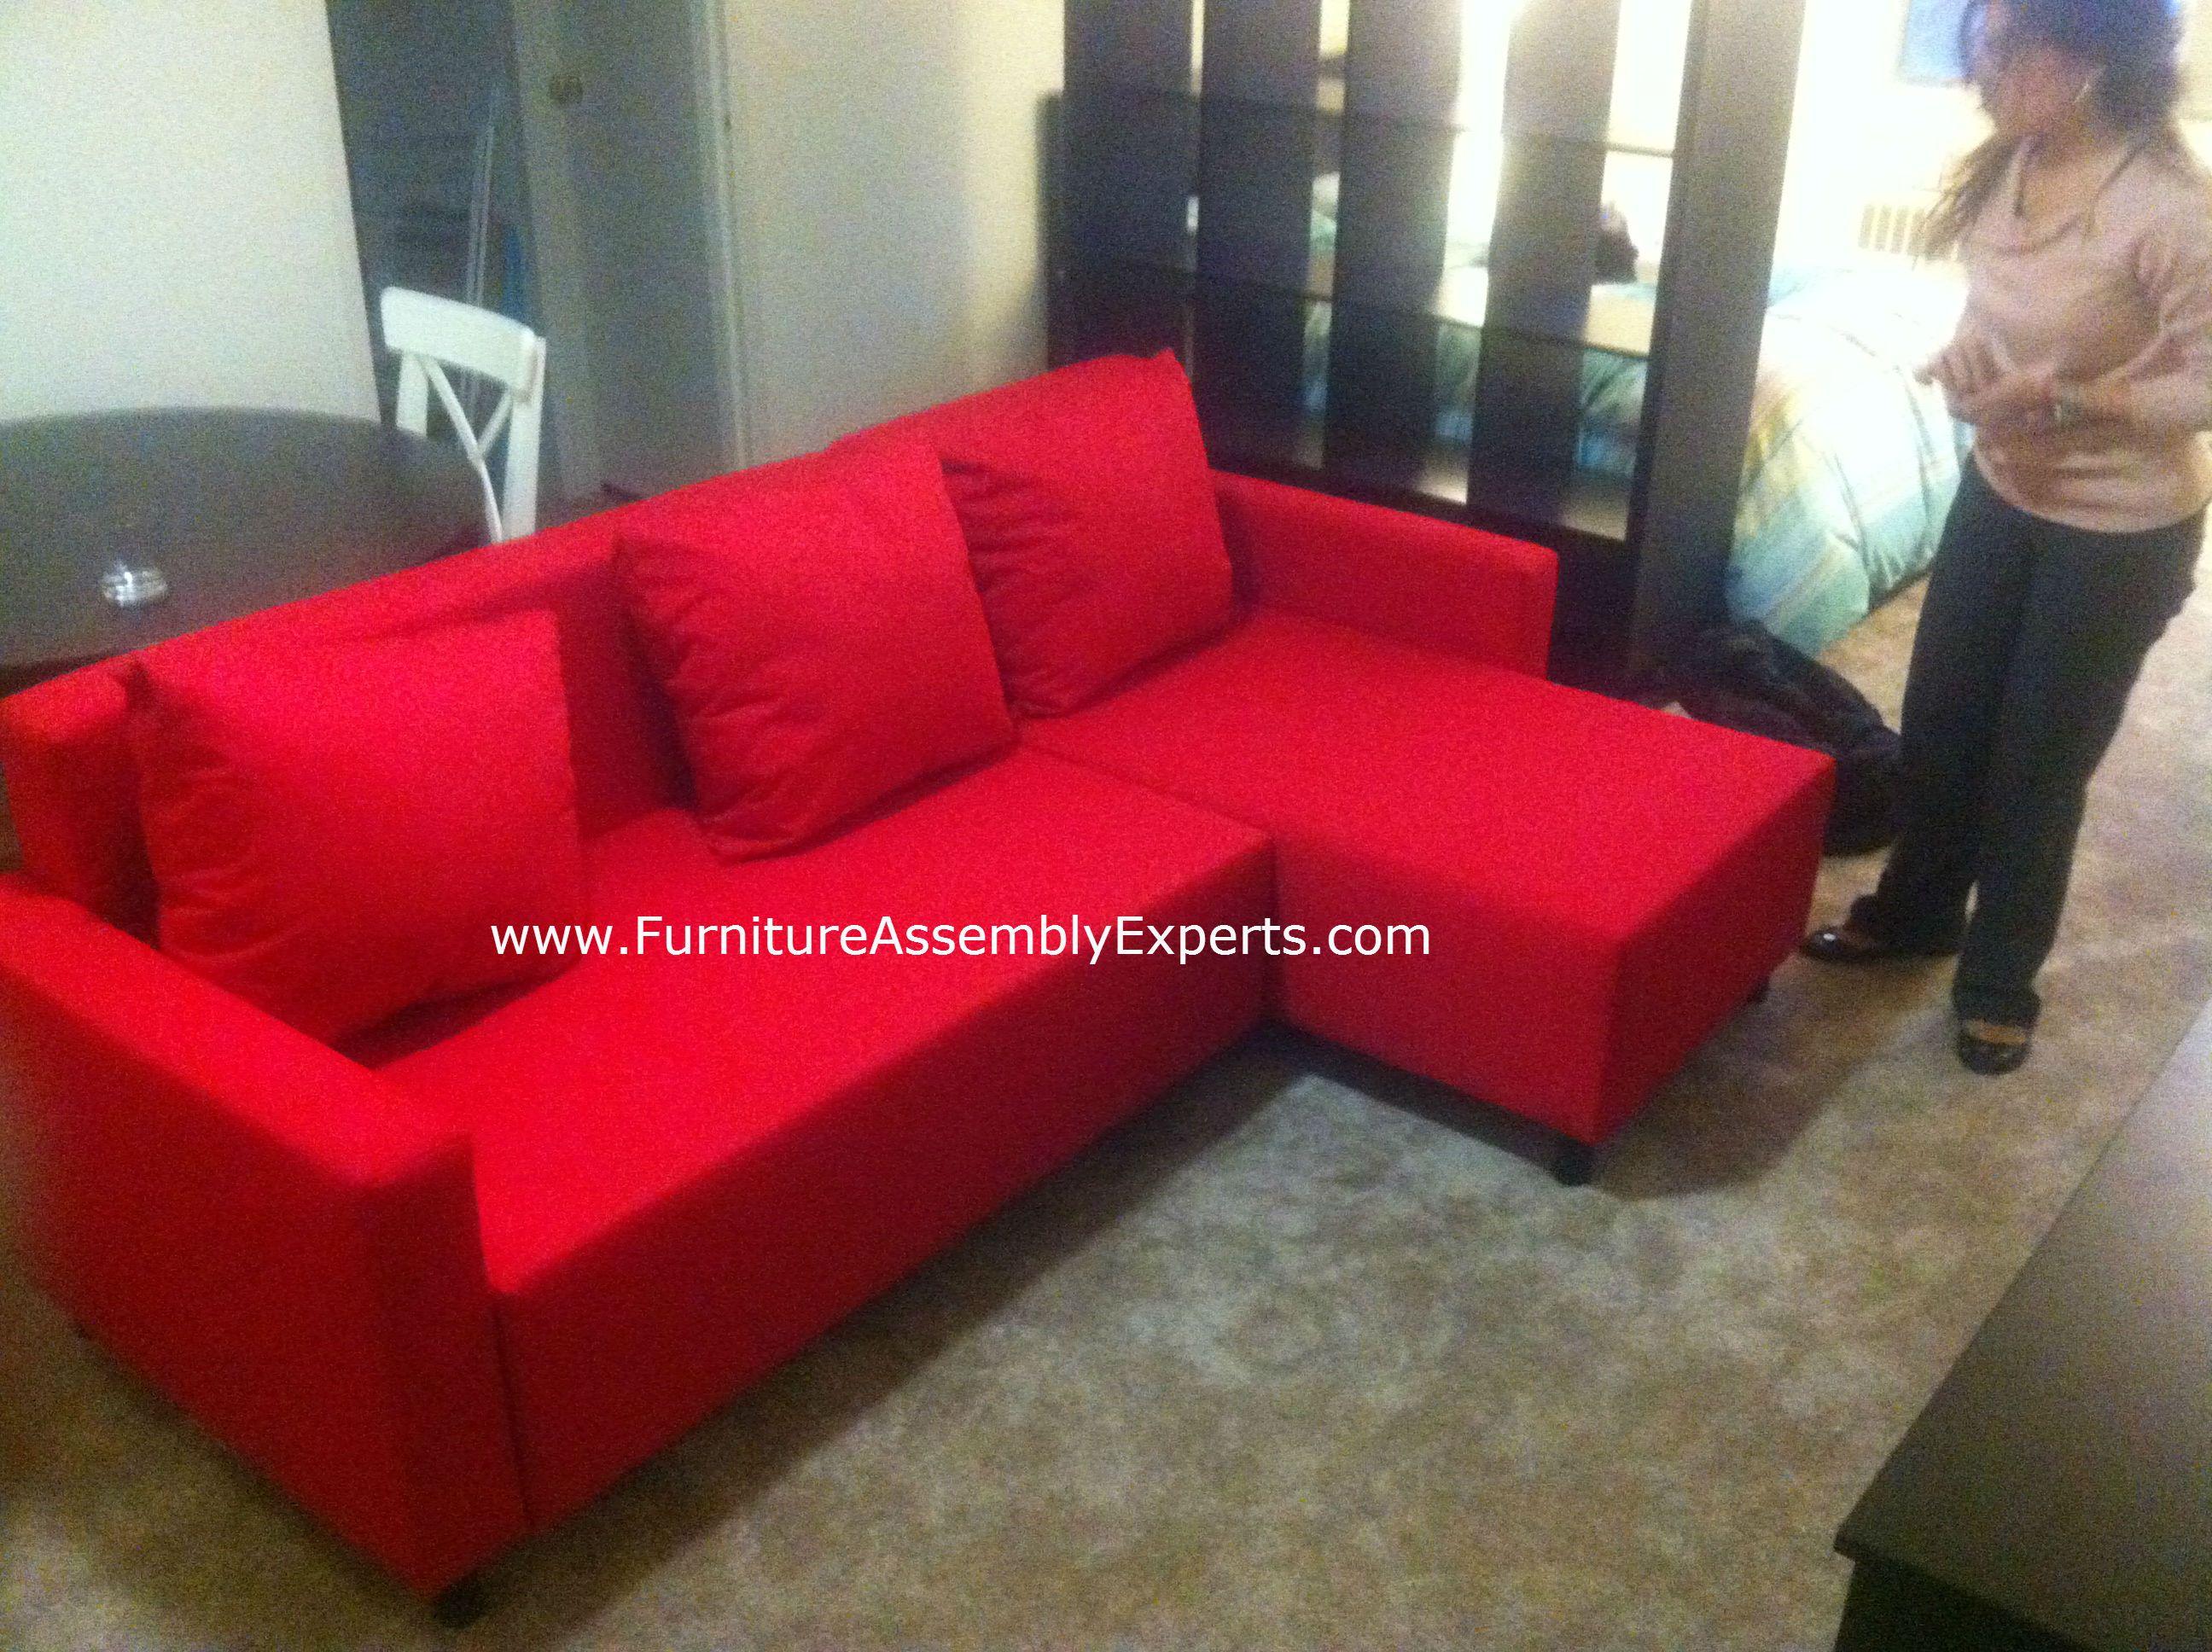 Ikea Lycksele Sofa Bed Orange Light Grey What Colour Rug Red Home Safe